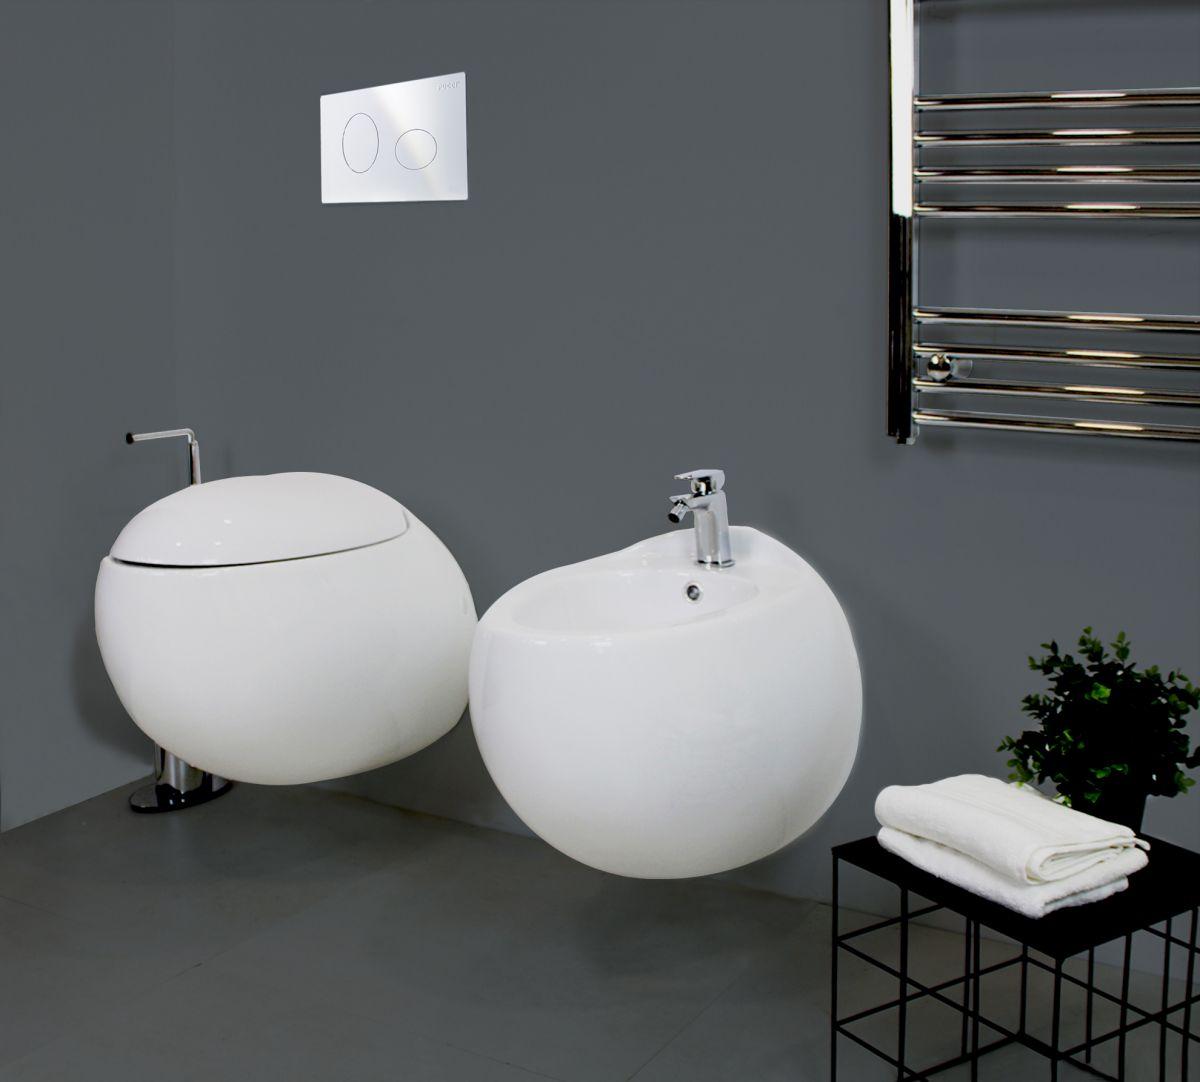 Sfera Sospeso 1 Sanitari Sospesi Sfera in ceramica Vaso+Bidet+Coprivaso Soft Close